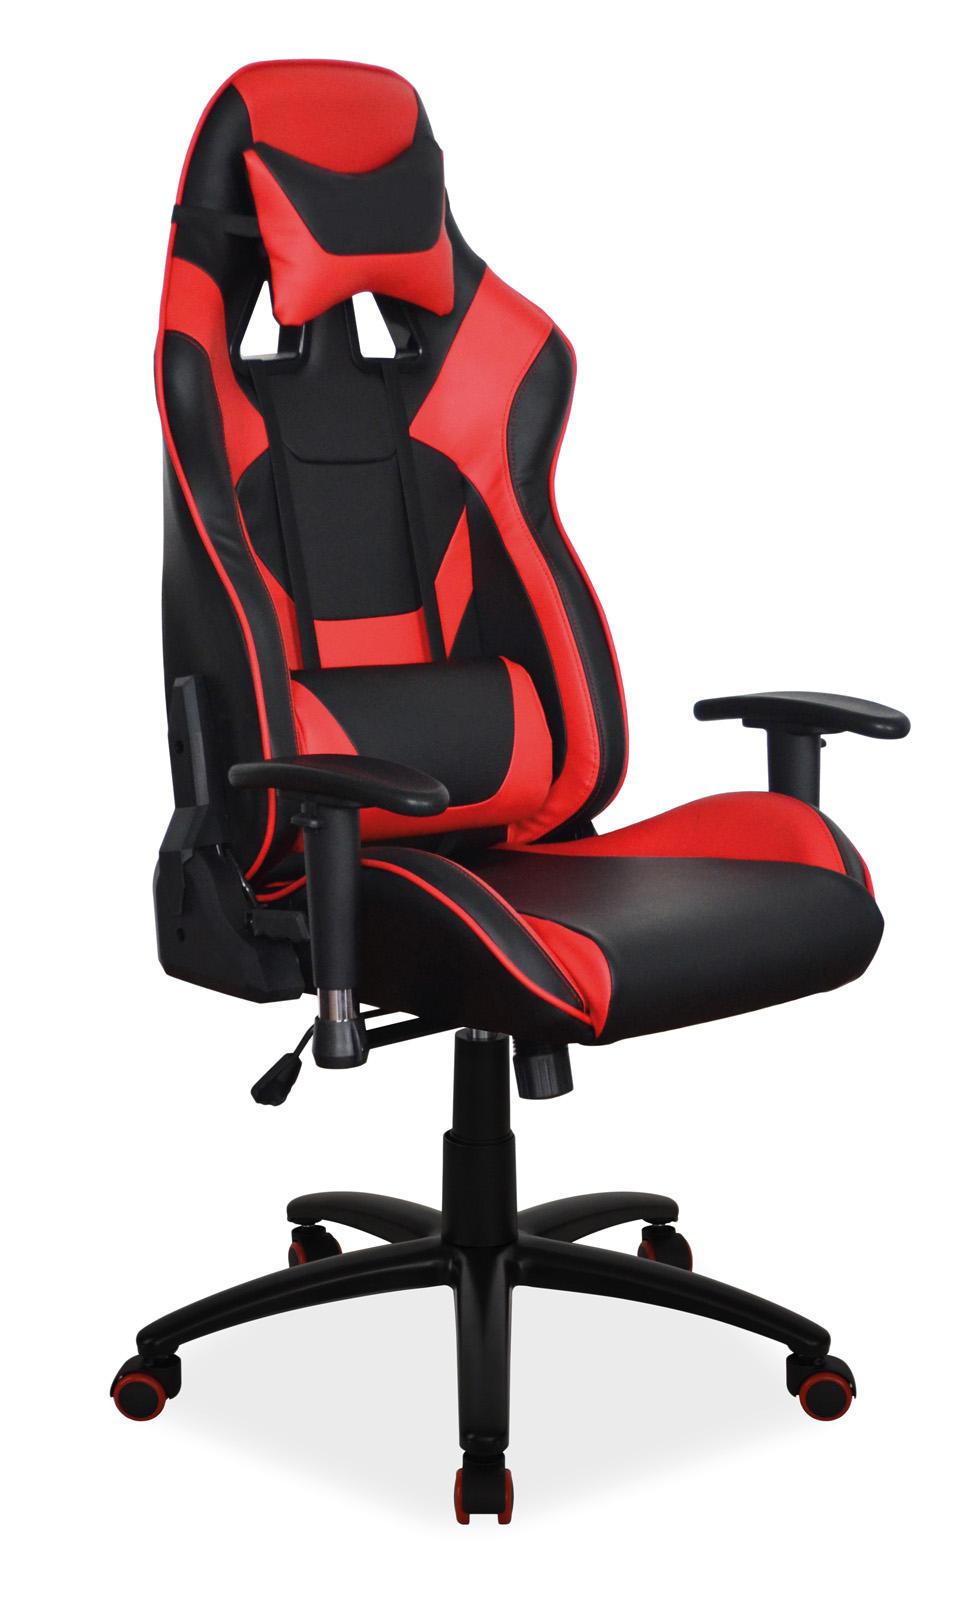 Scaun de birou ergonomic Supra Black / Red